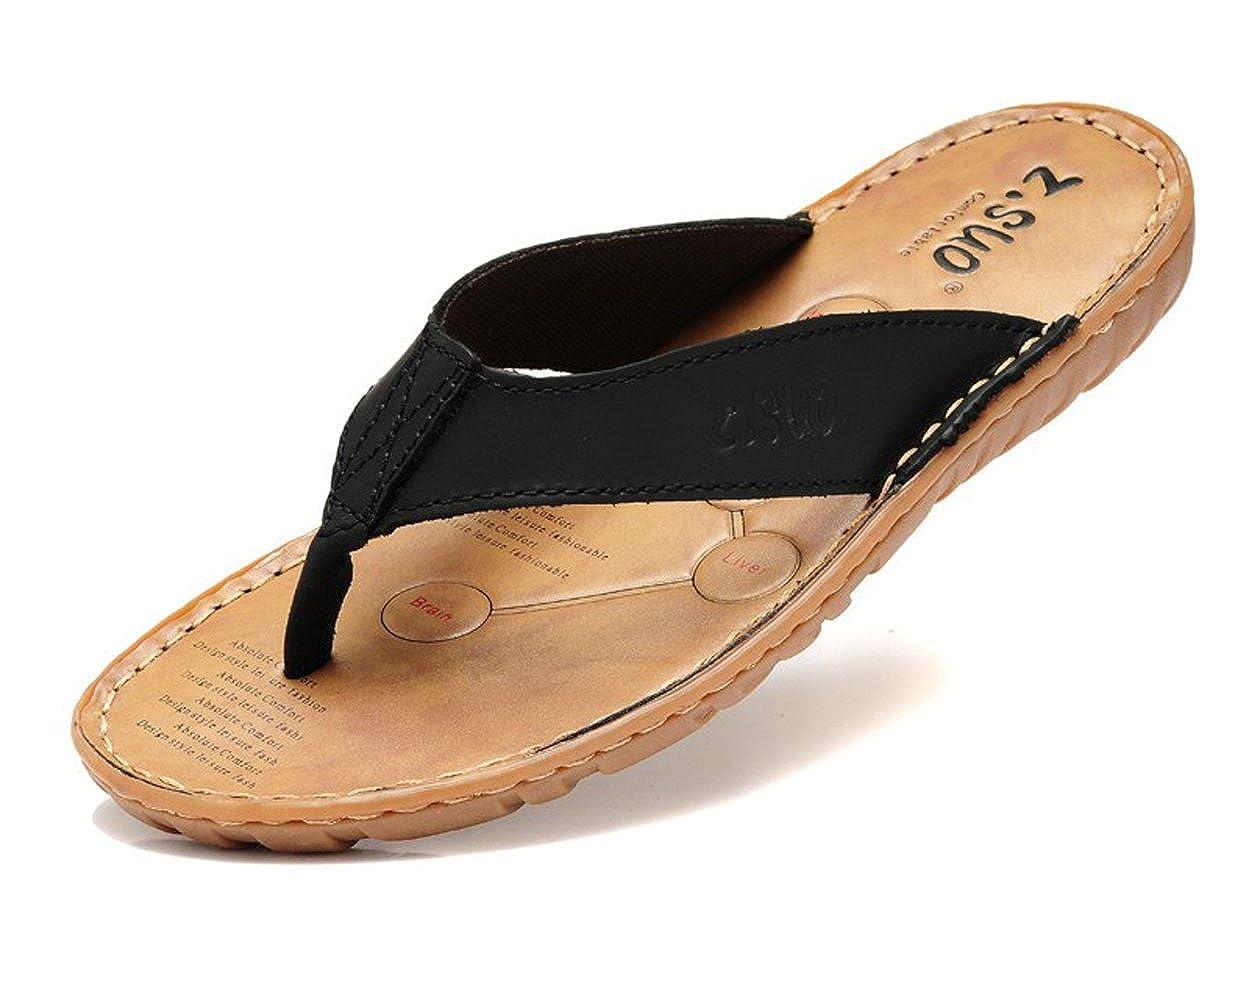 DQQ Mens Black Leather Stitch Thong Sandal 8 US